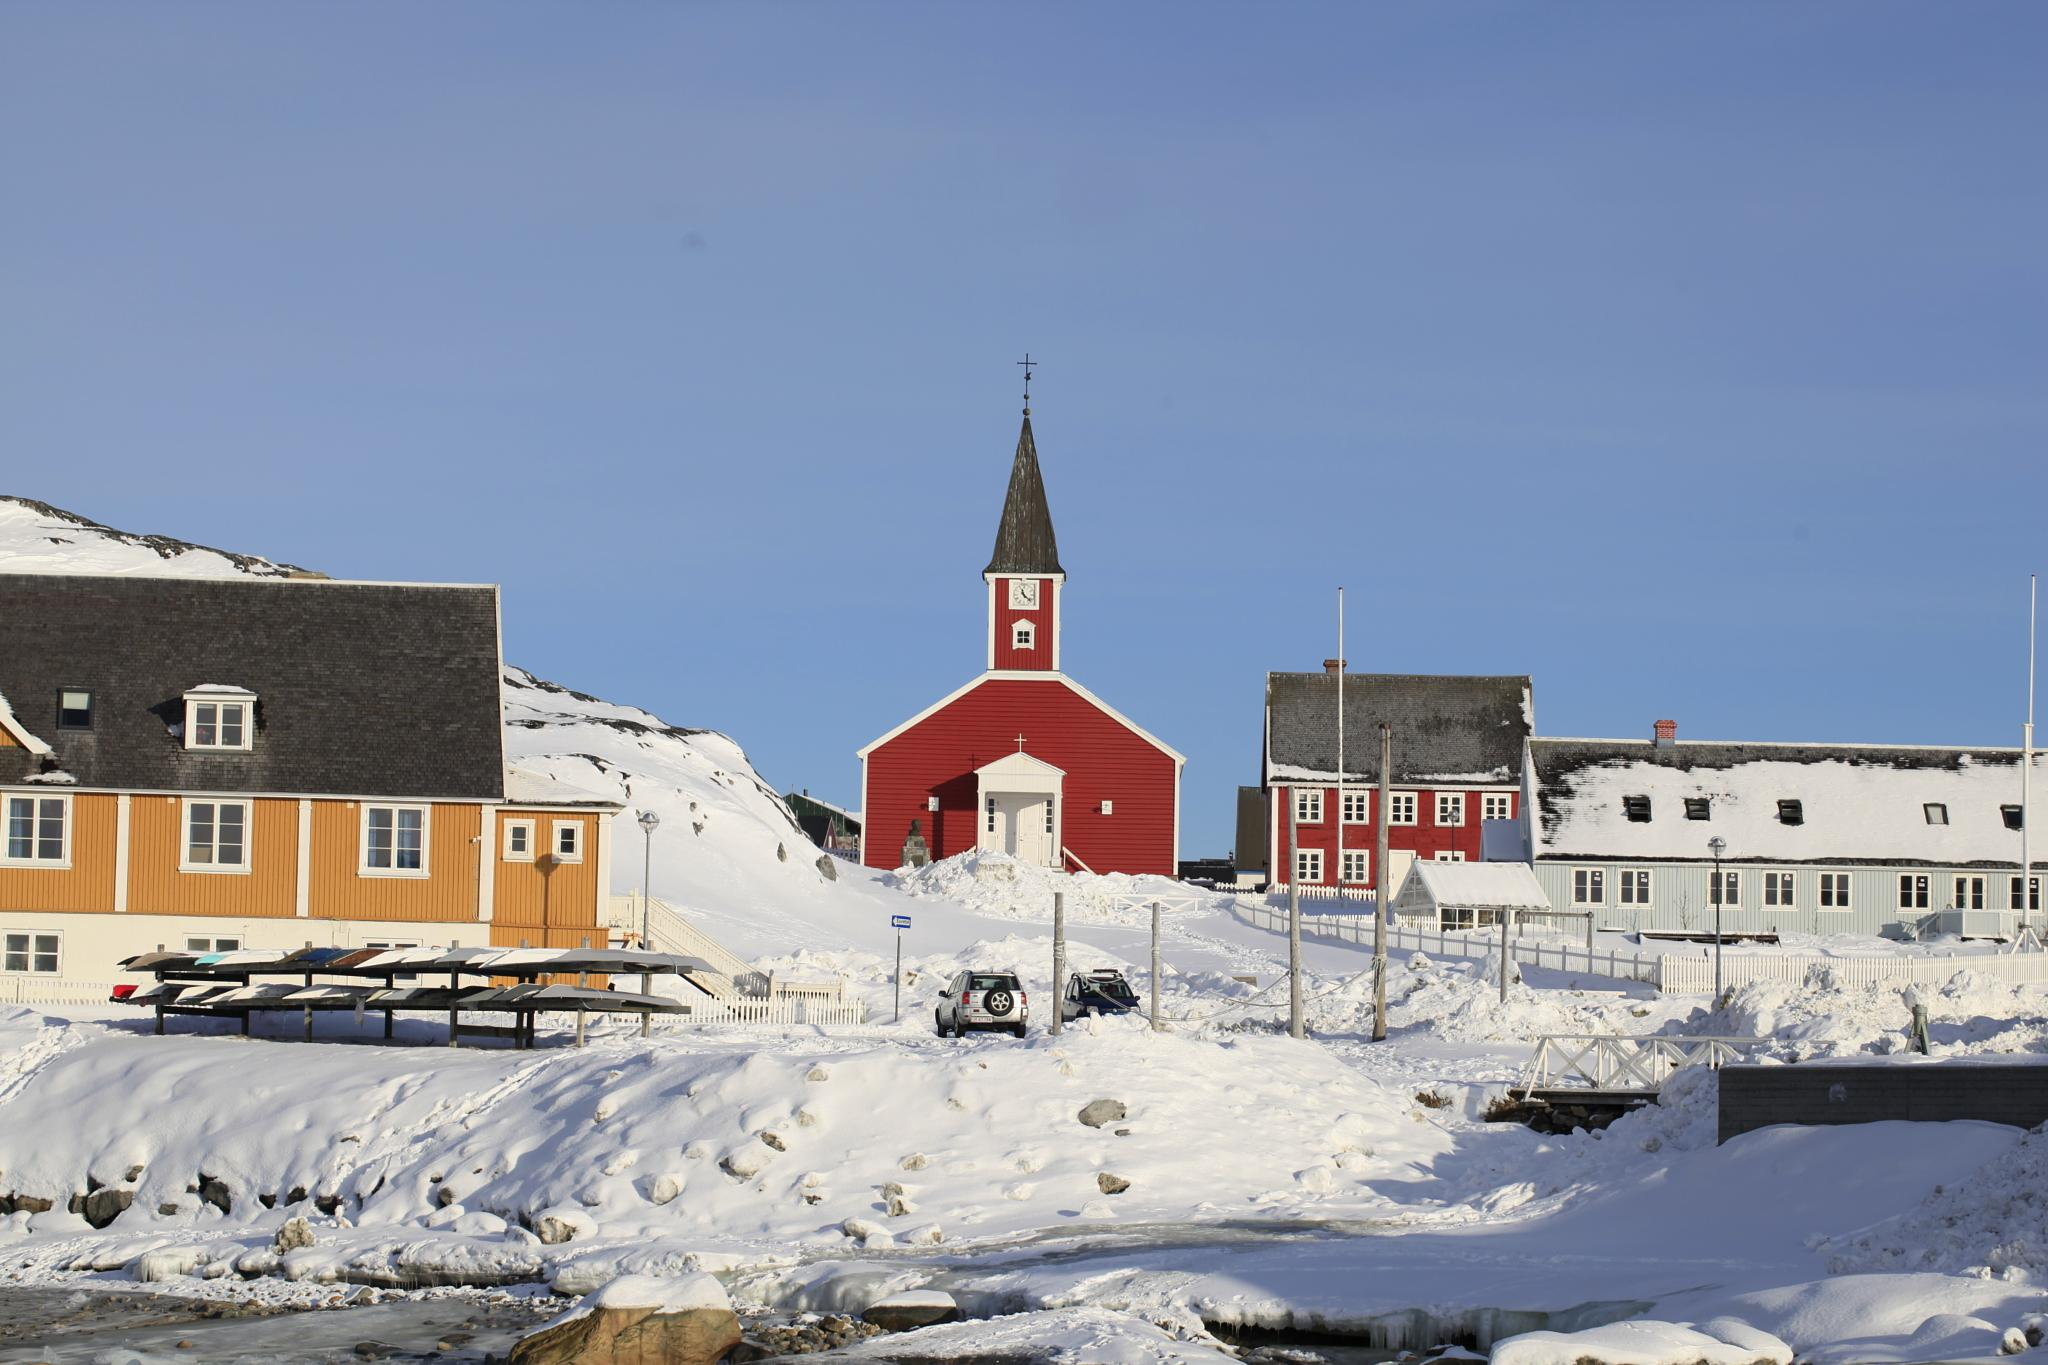 old town nuuk by Tom Augo Lynge